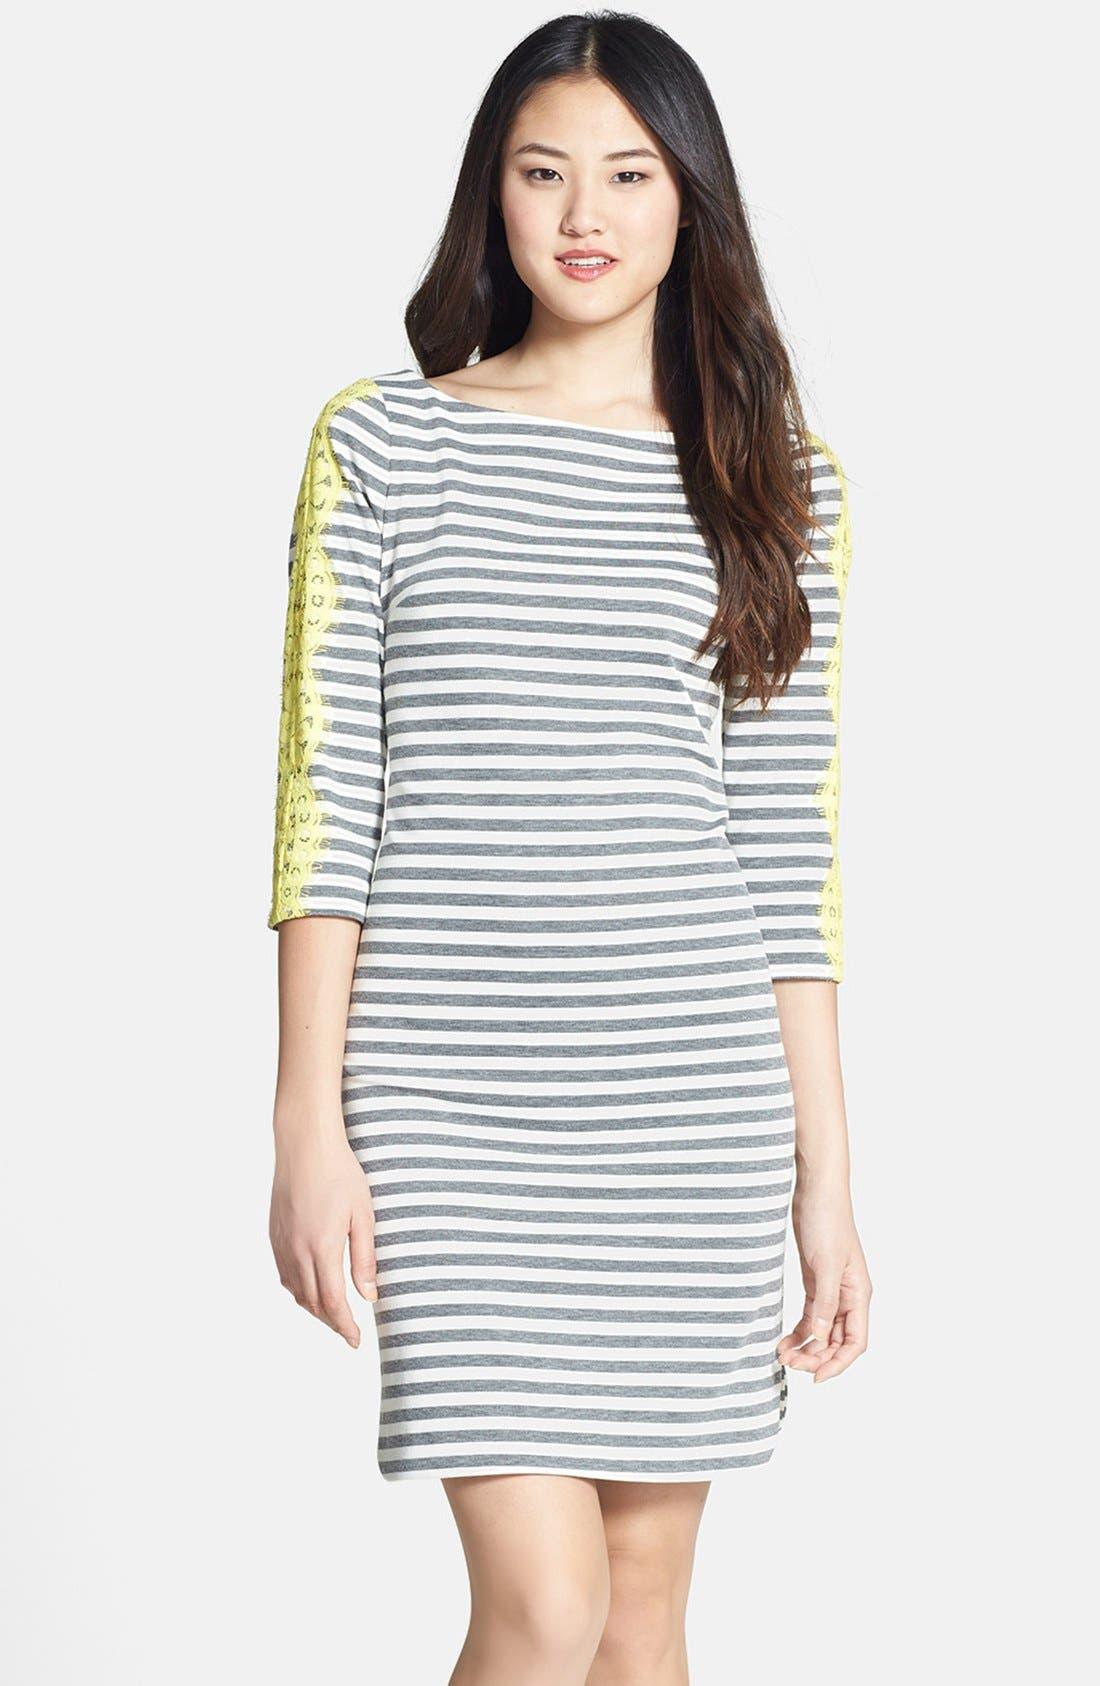 Alternate Image 1 Selected - Eliza J Lace Detail Stripe Ponte Knit Shirttail Dress (Regular & Petite)